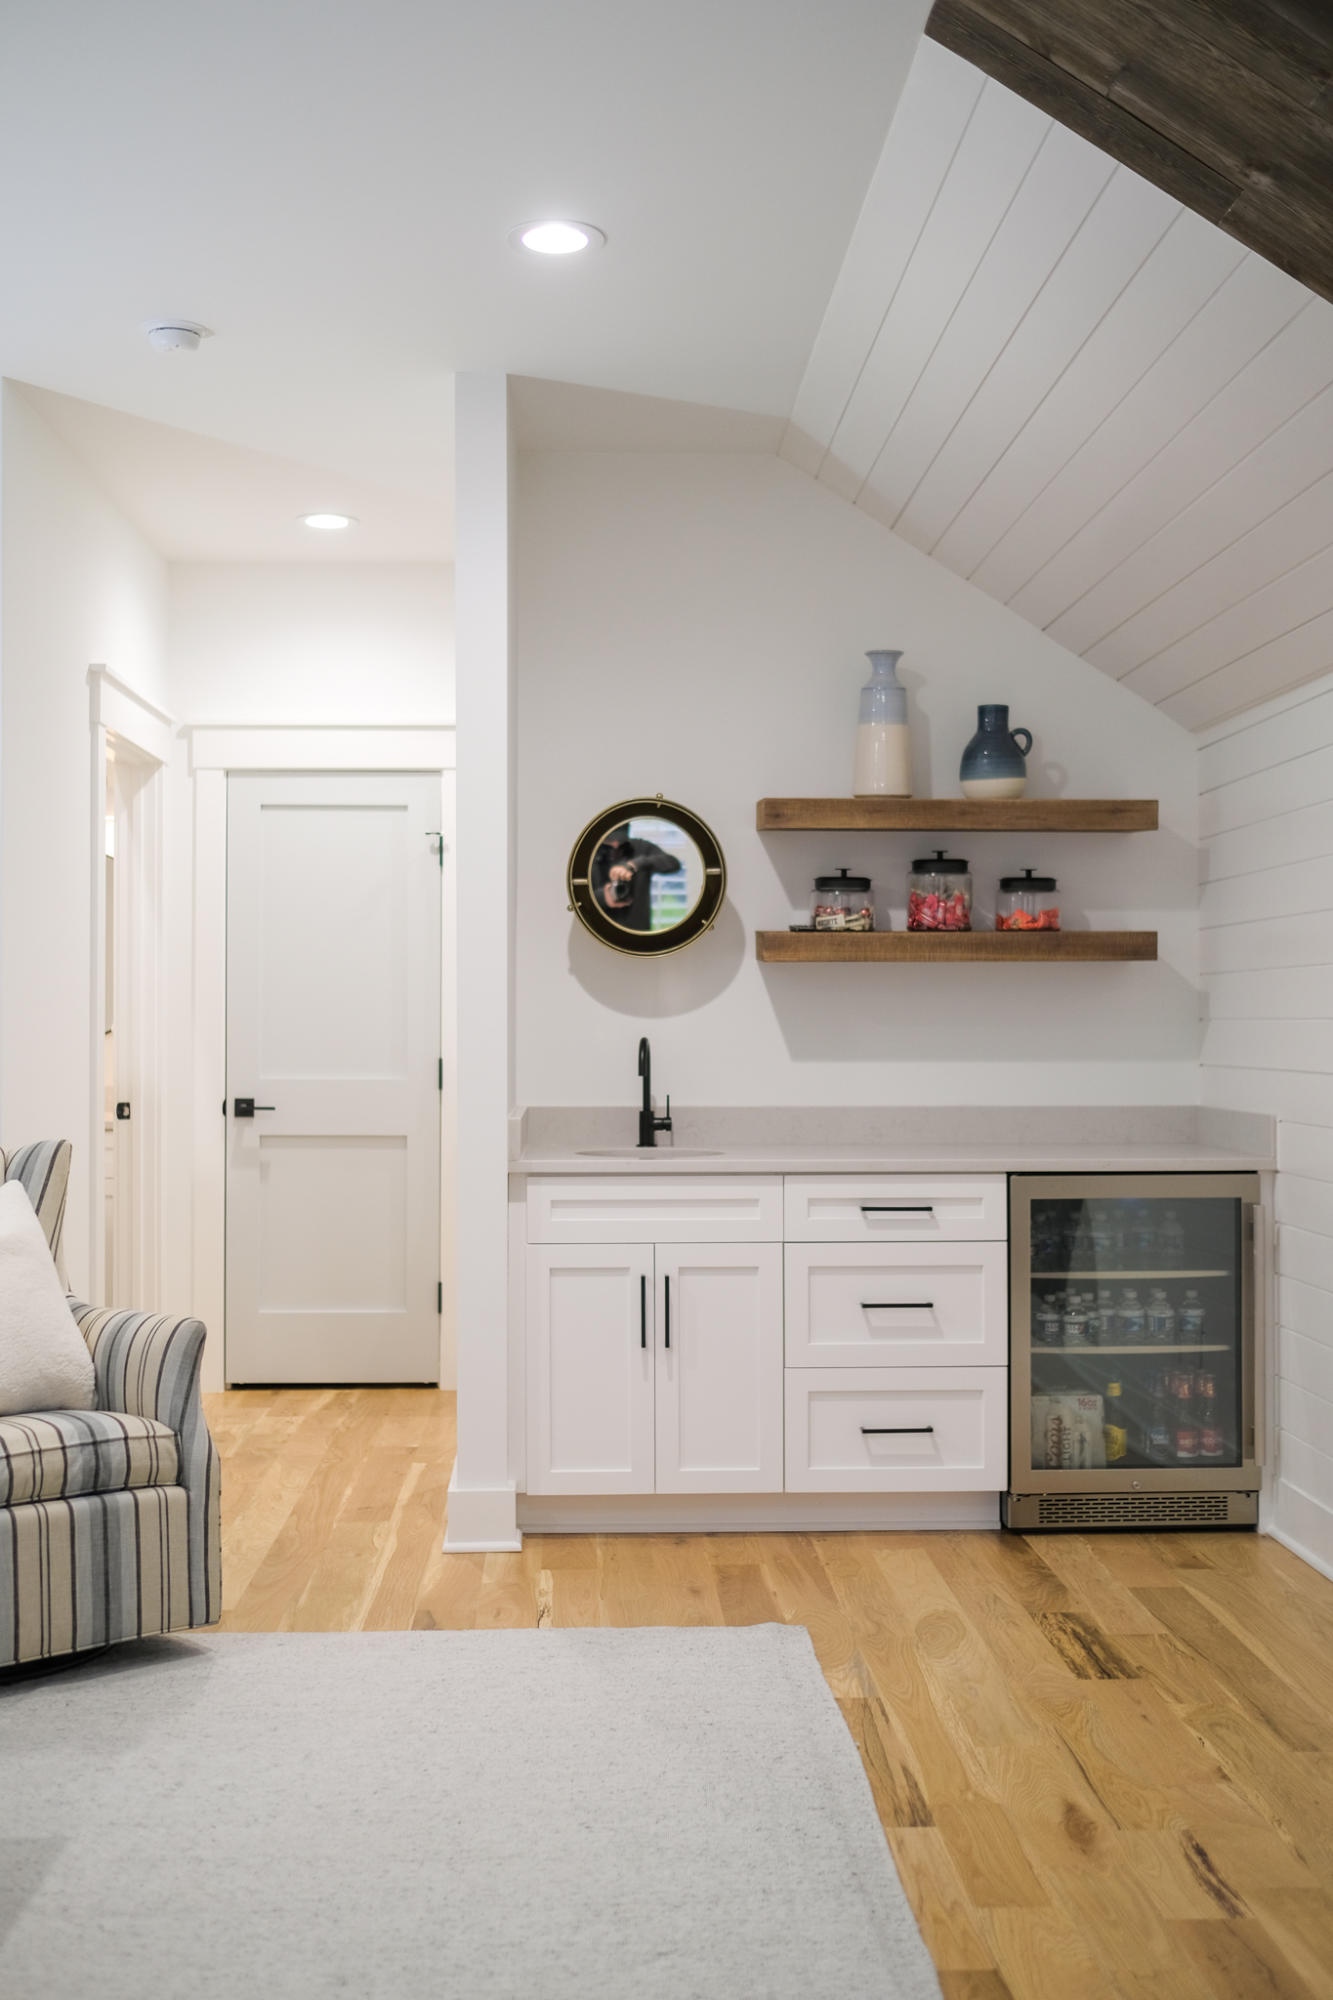 Daniel Island Park Homes For Sale - 208 Brailsford, Charleston, SC - 12